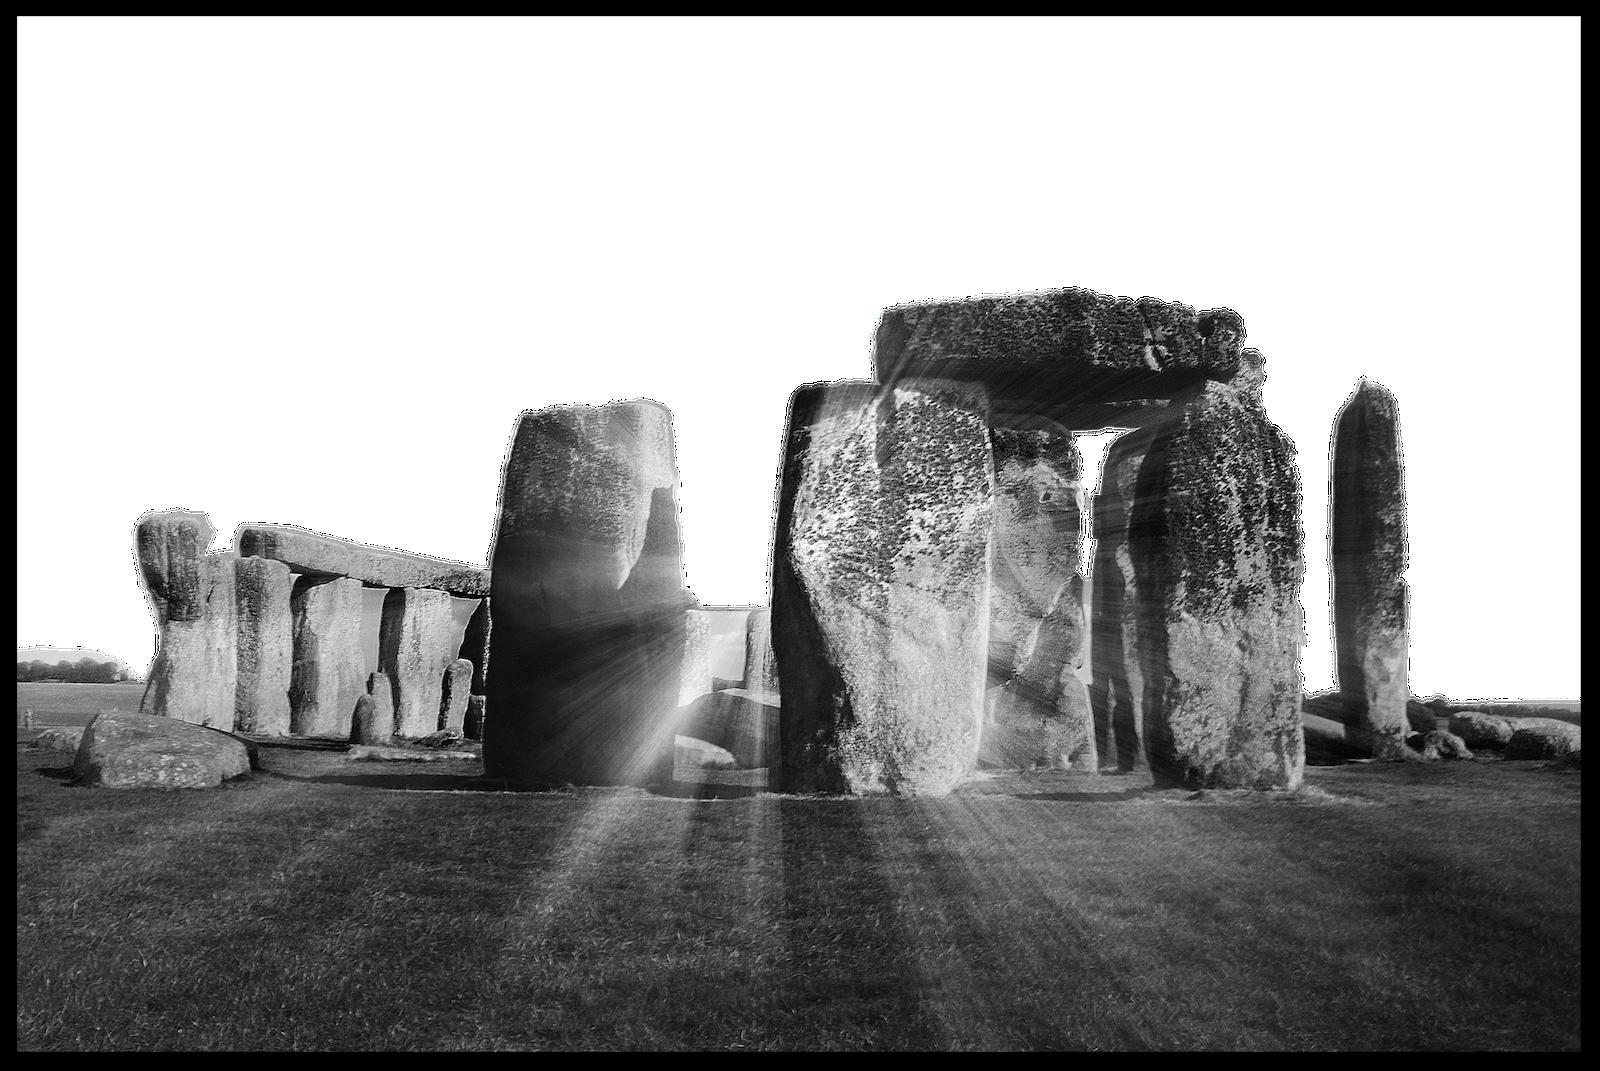 stonehenge 1071x1600.png